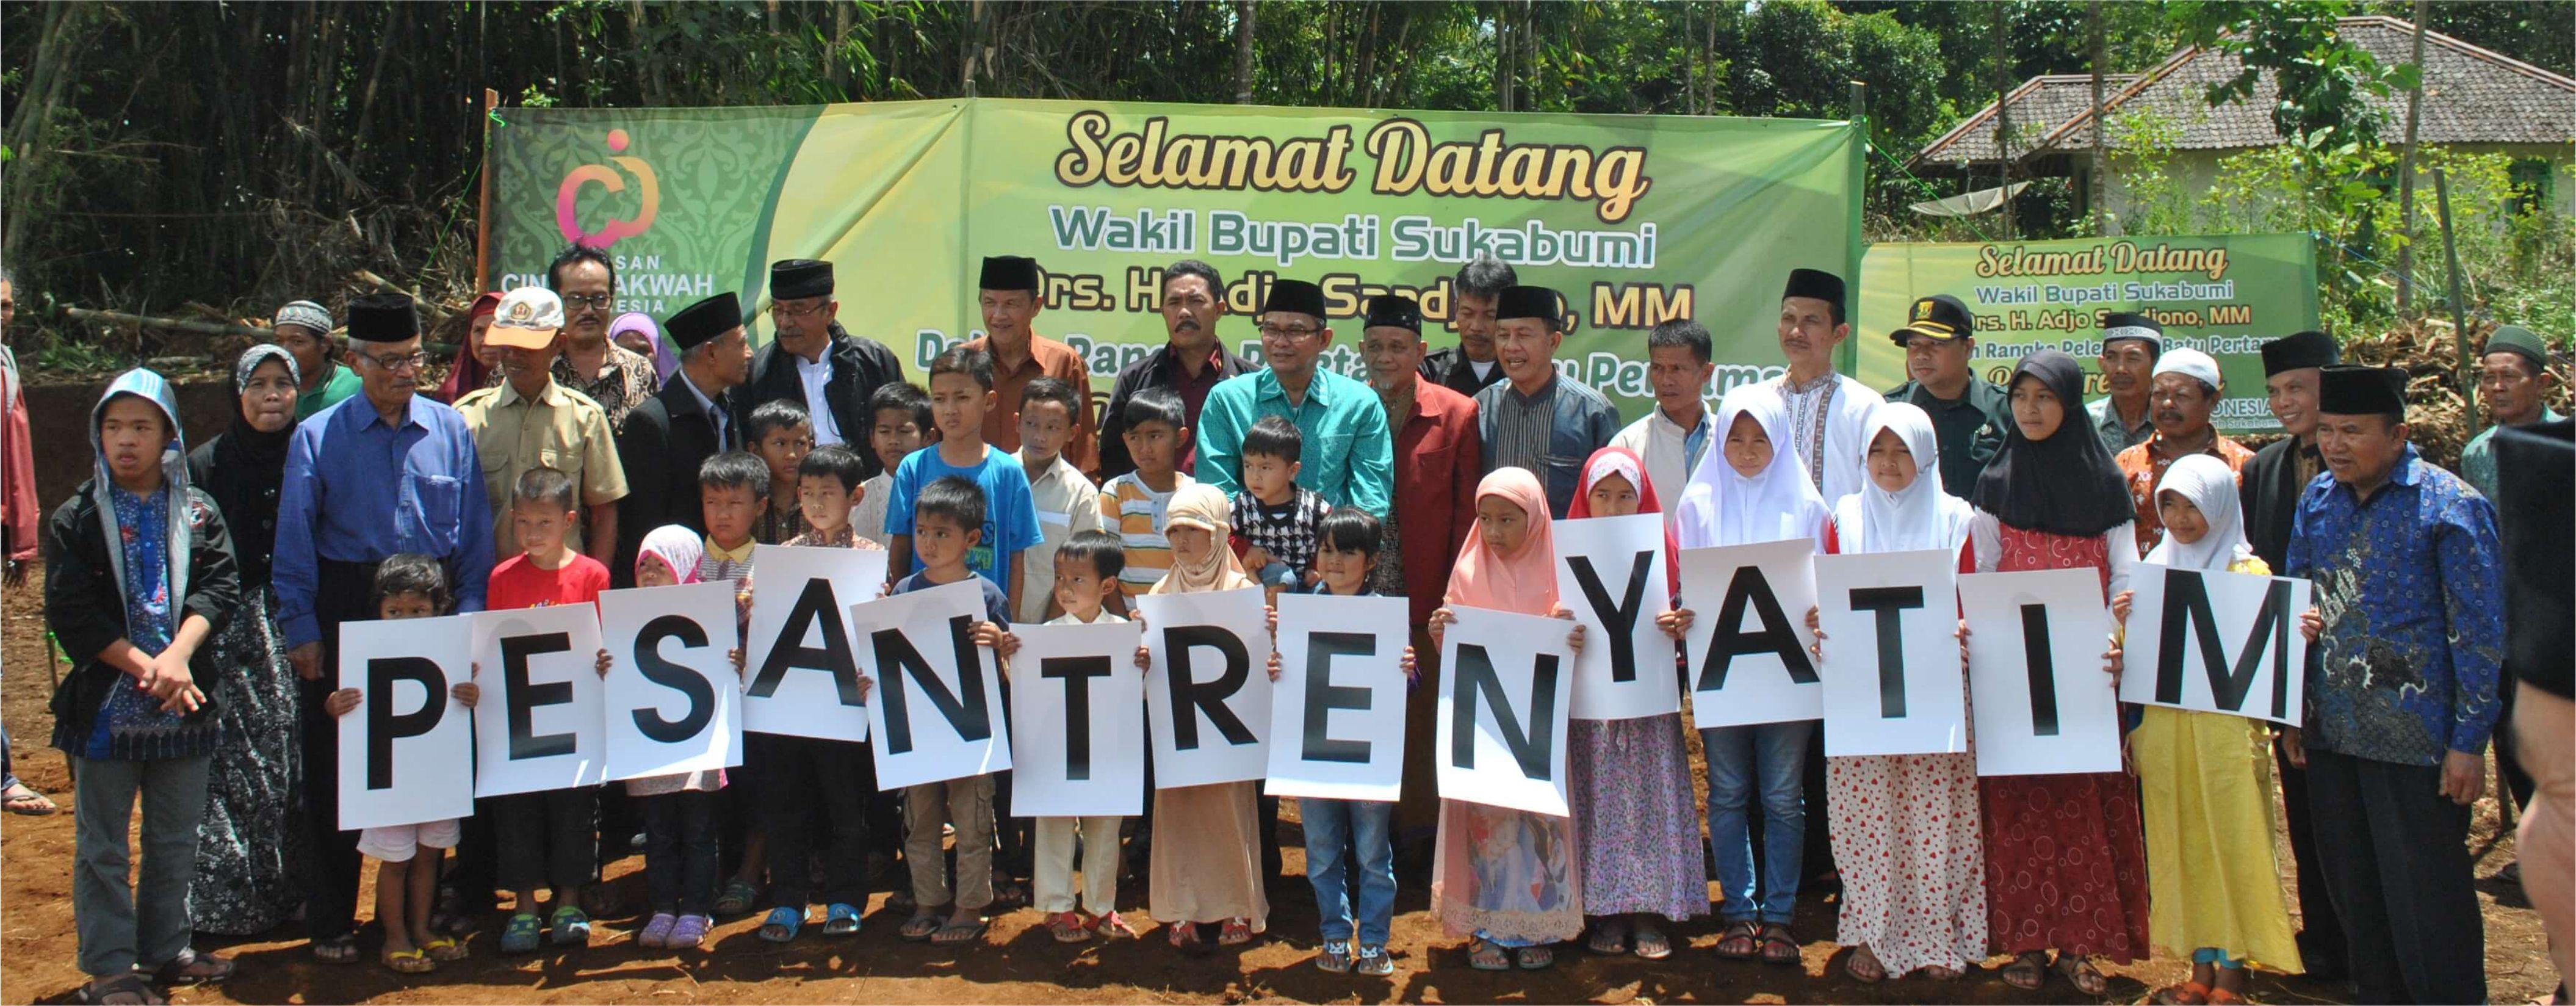 Pesantren Yatim Indonesia 1